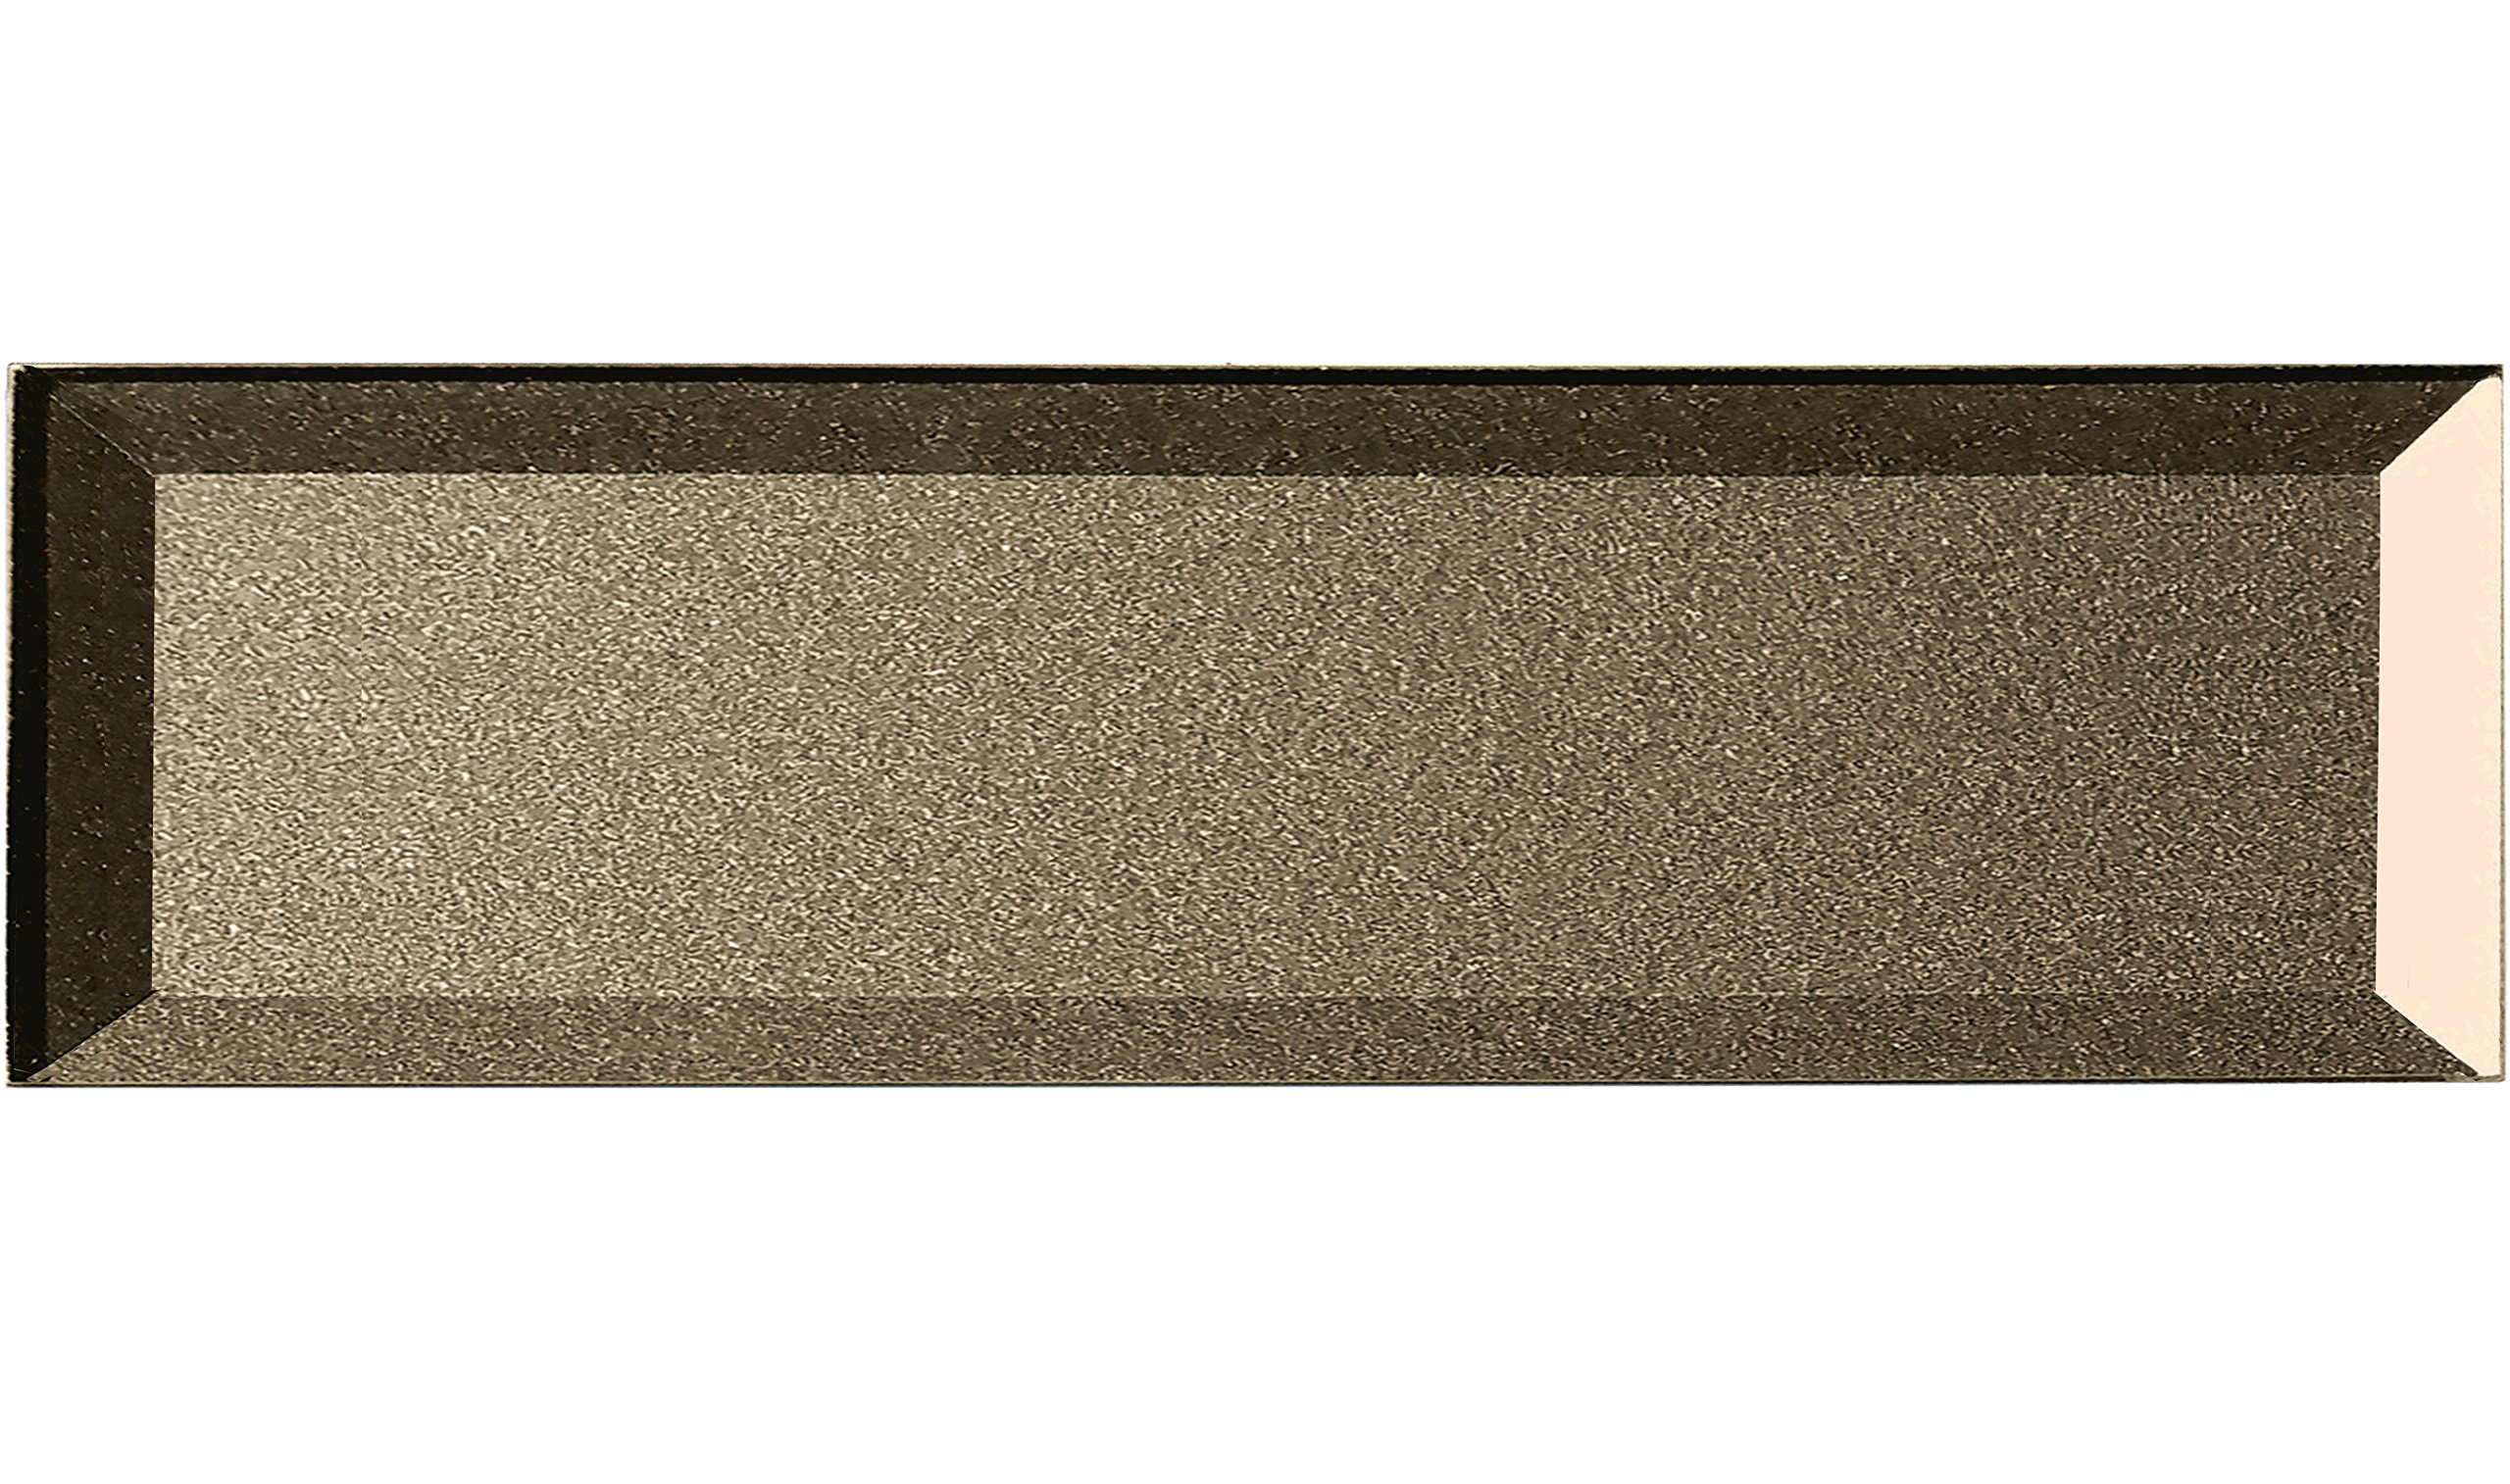 Abolos Inner Bevel 3D Glass Subway Tile Kitchen Bathroom Backsplash Home, 4'' W x L, 12 sq. ft, 28 Piece AMZJAB0416-BR 4'' W x L, 4'' W x 16'' L, Bronze